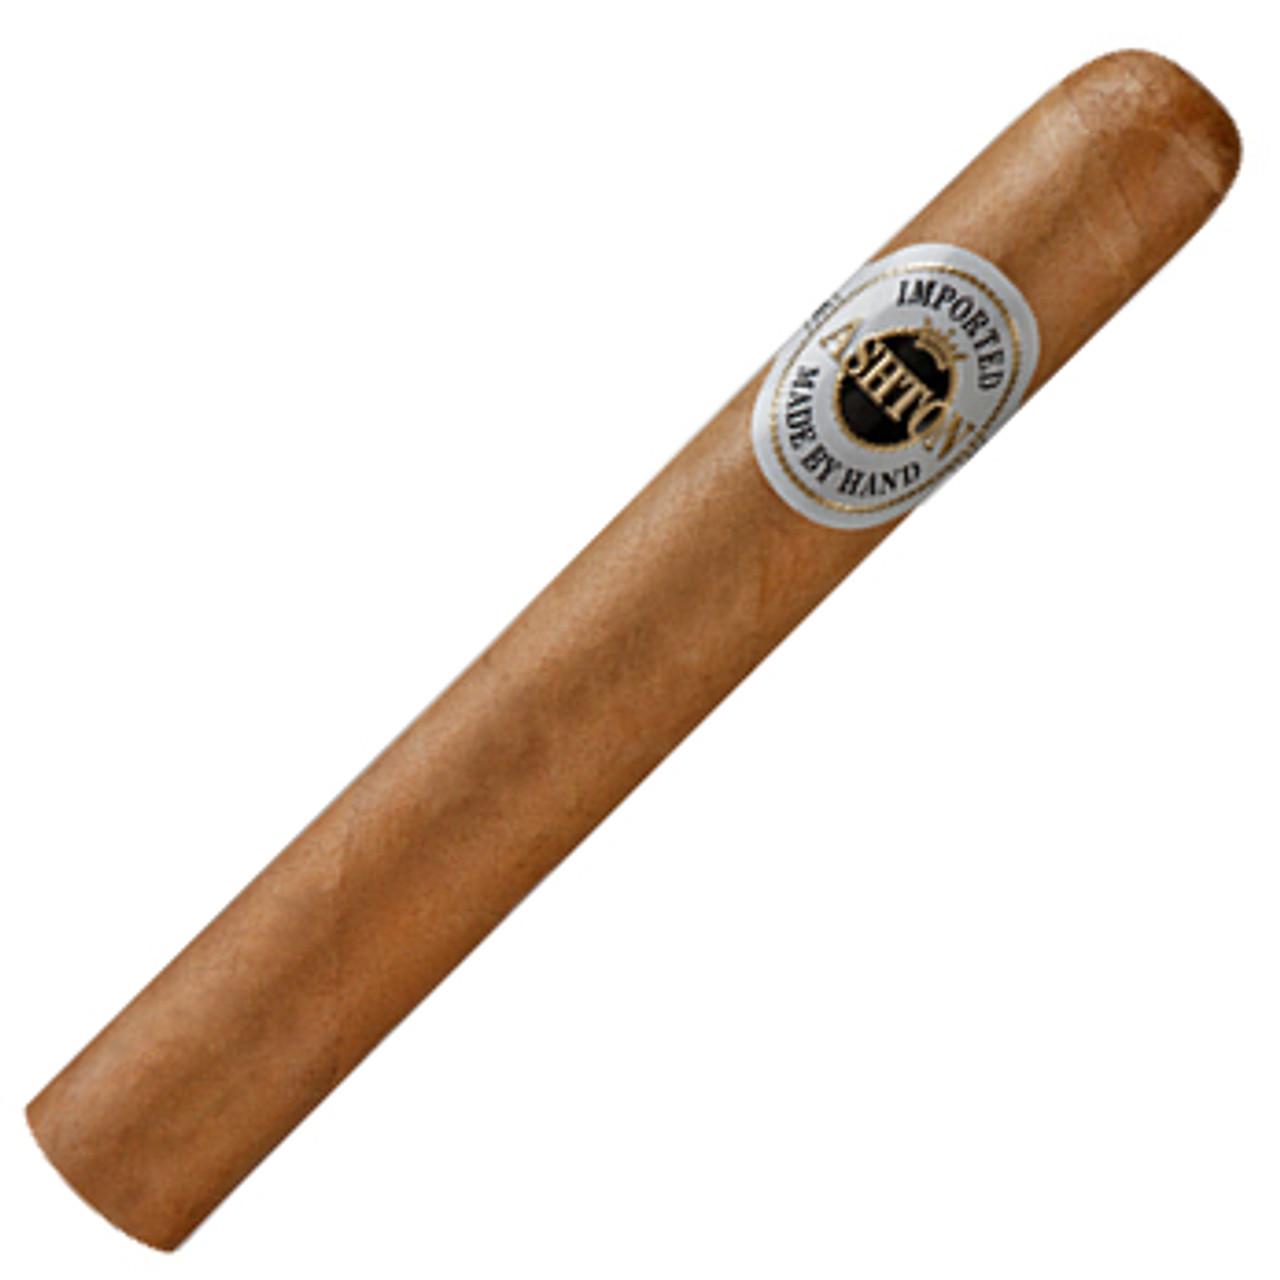 Ashton Monarch Aluminum Tubes Cigars  - 6 x 50 (Cedar Chest of 24)